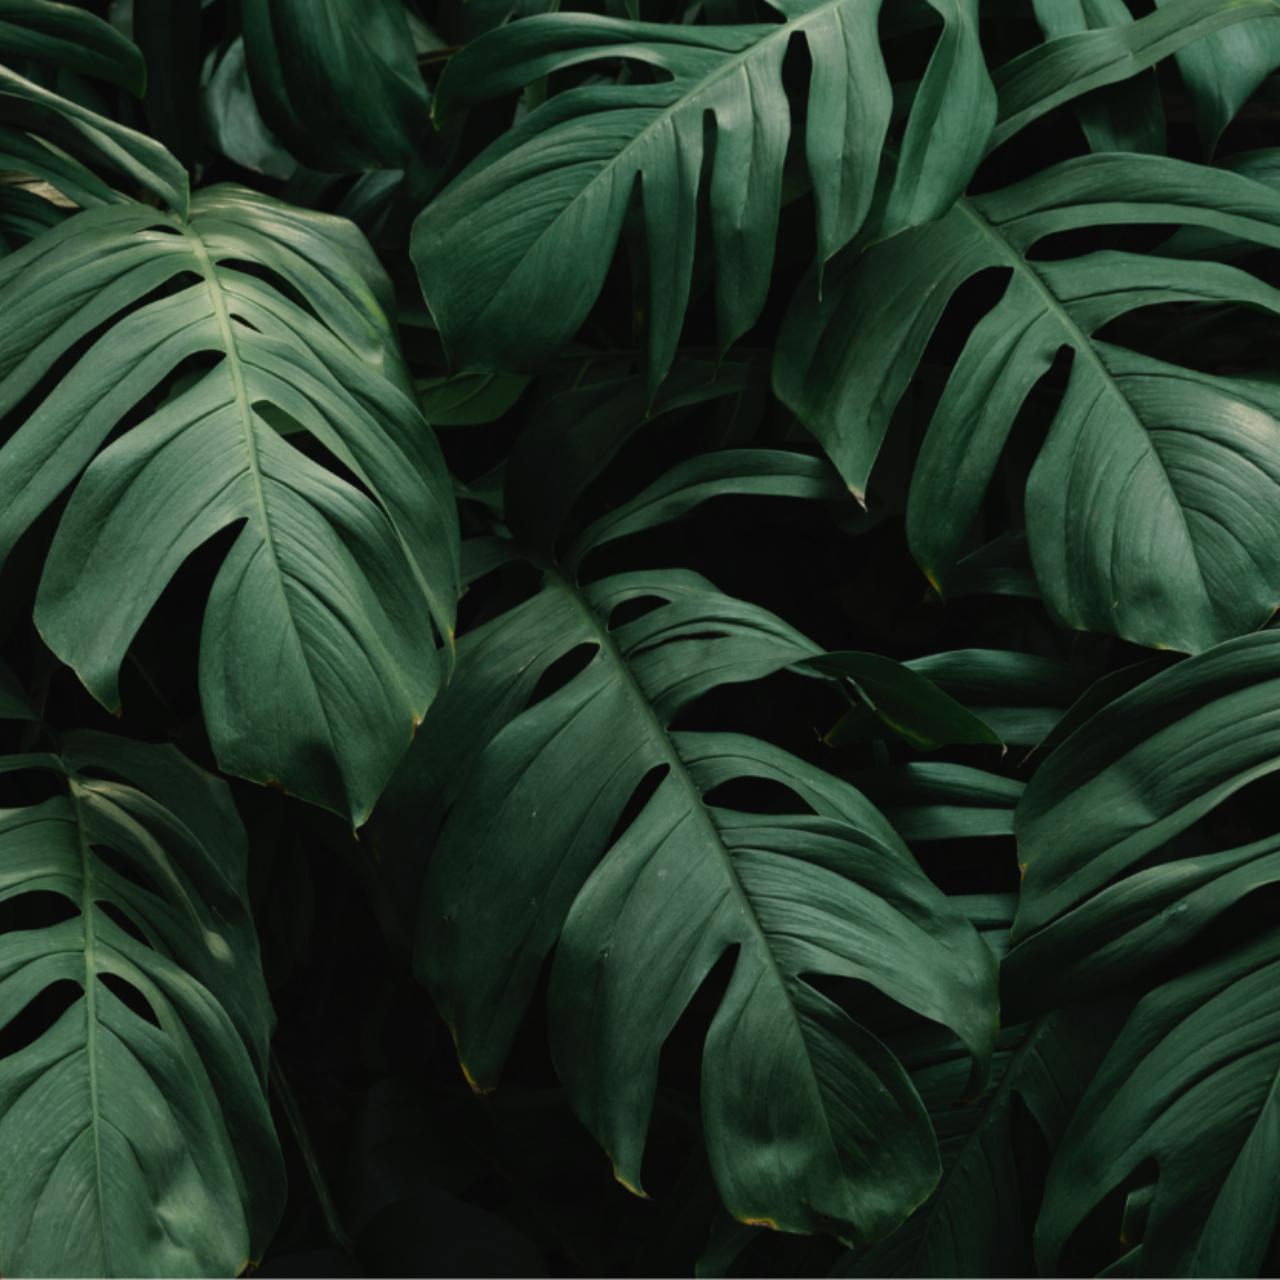 Grosse grüne Blätter